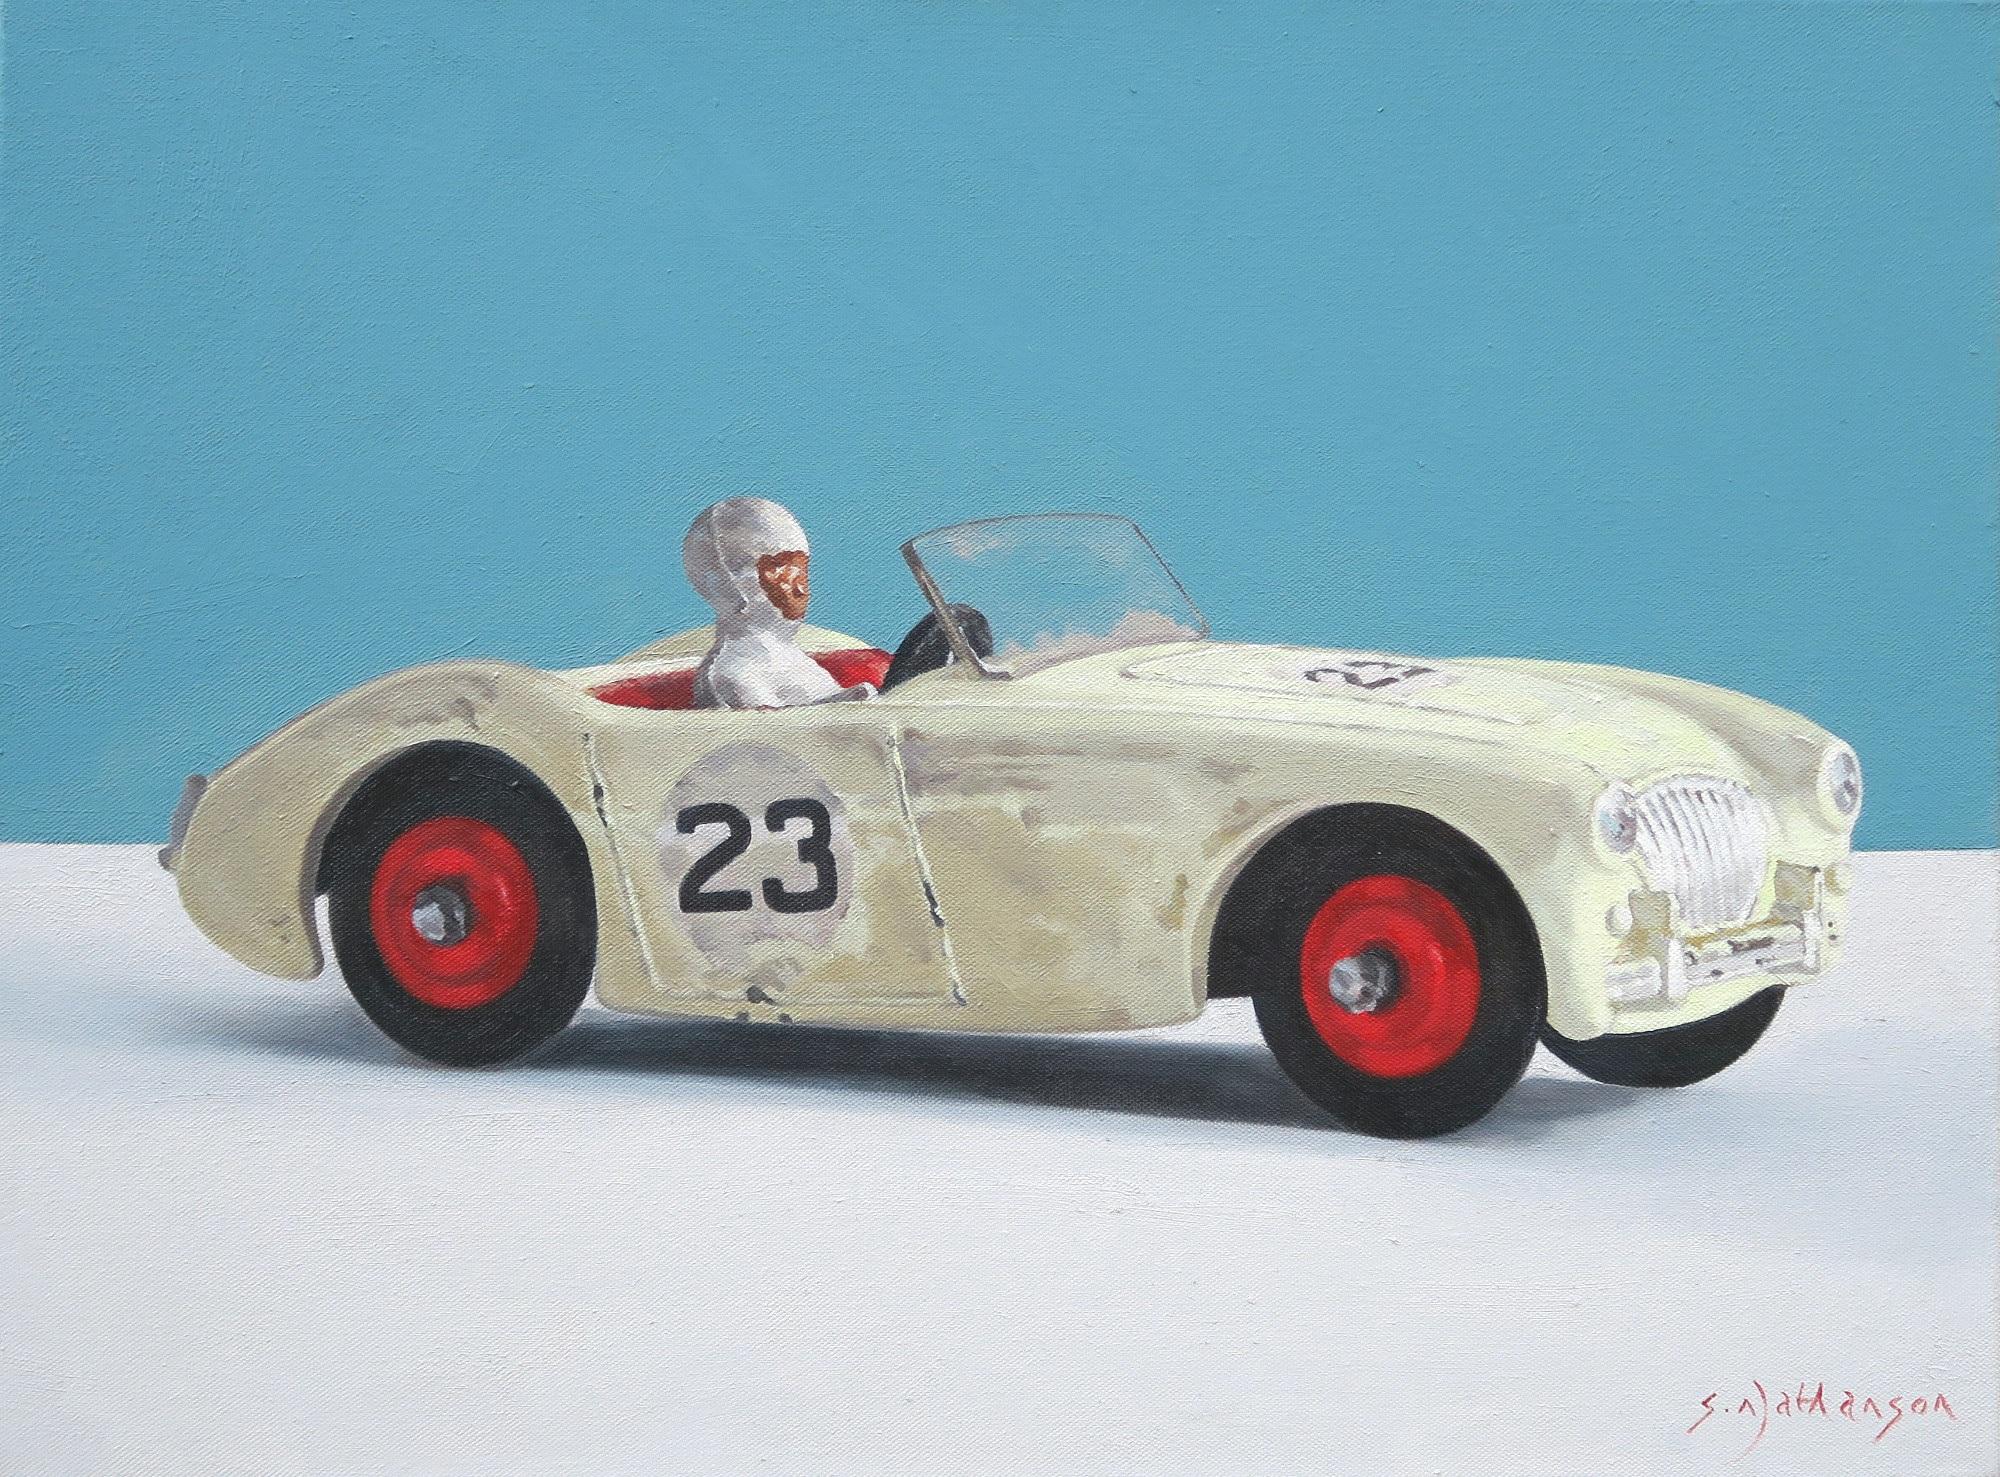 Austin Healey 100 Sports Car (Model no. 109, 1955-1959)